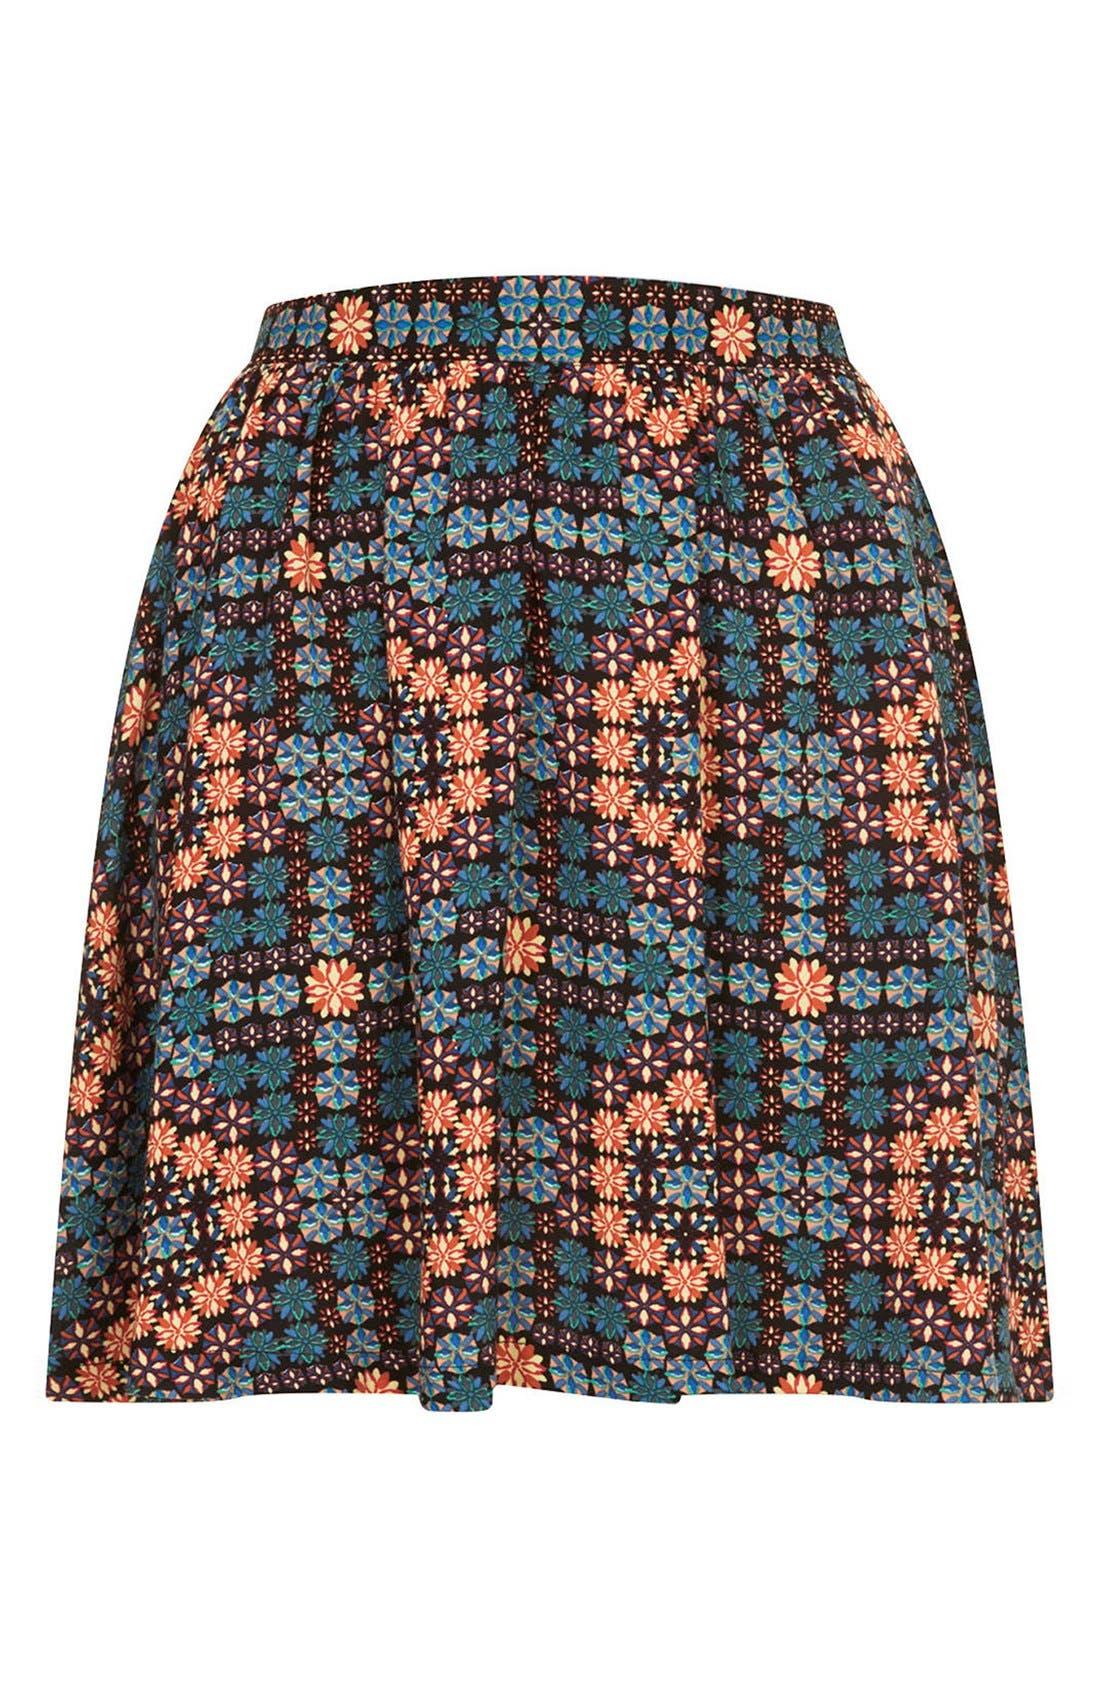 Alternate Image 3  - Topshop 'Milly' Tile Print Skirt